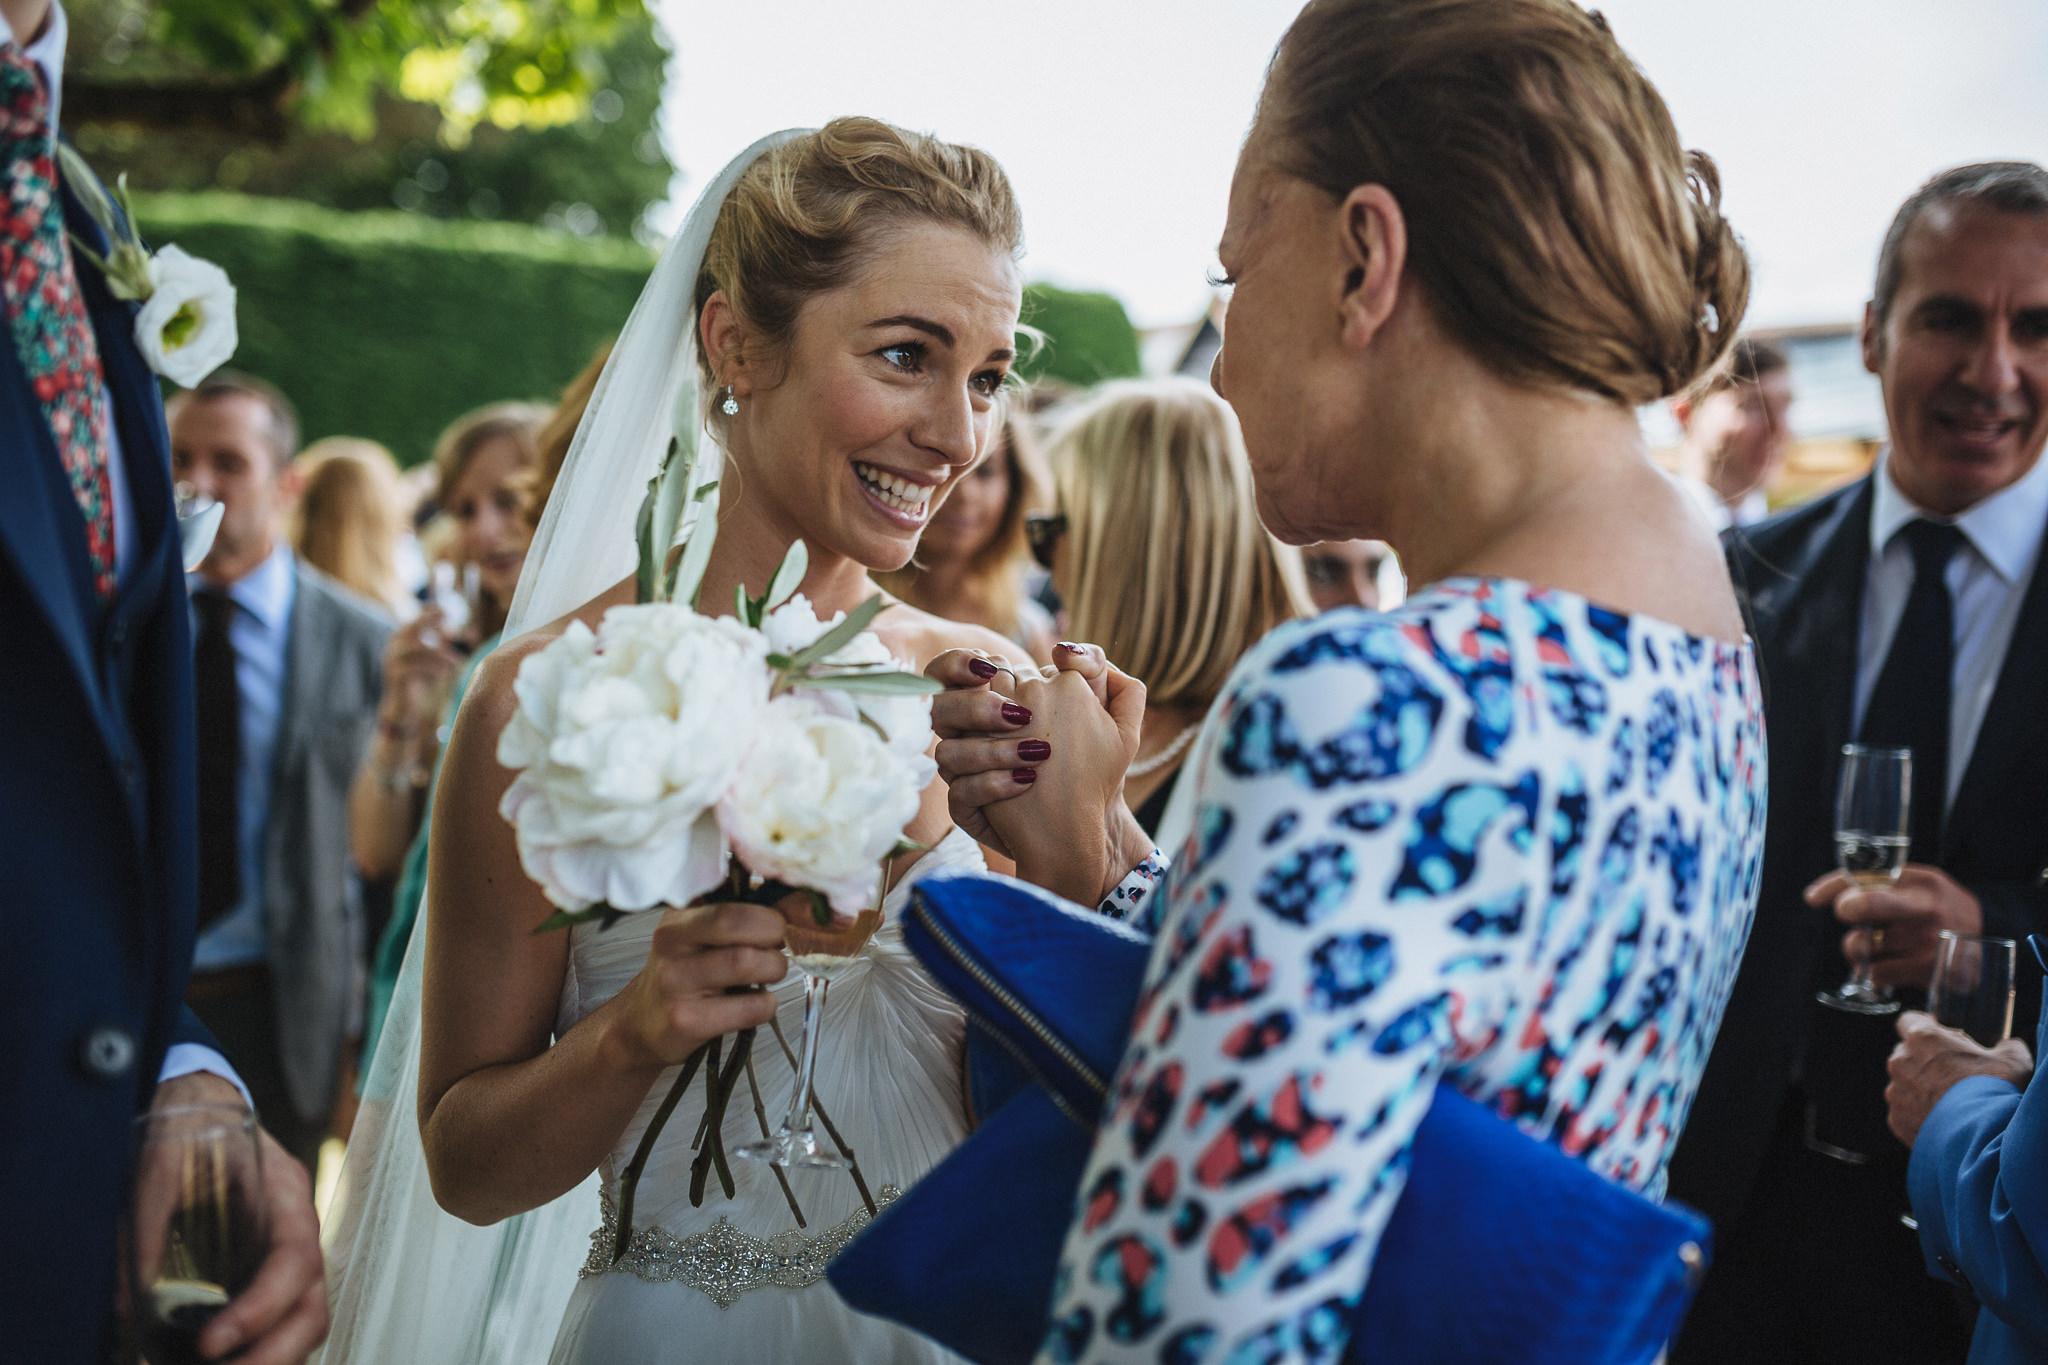 paul-marbrook-Gaynes-Park Wedding-Photographer-90079